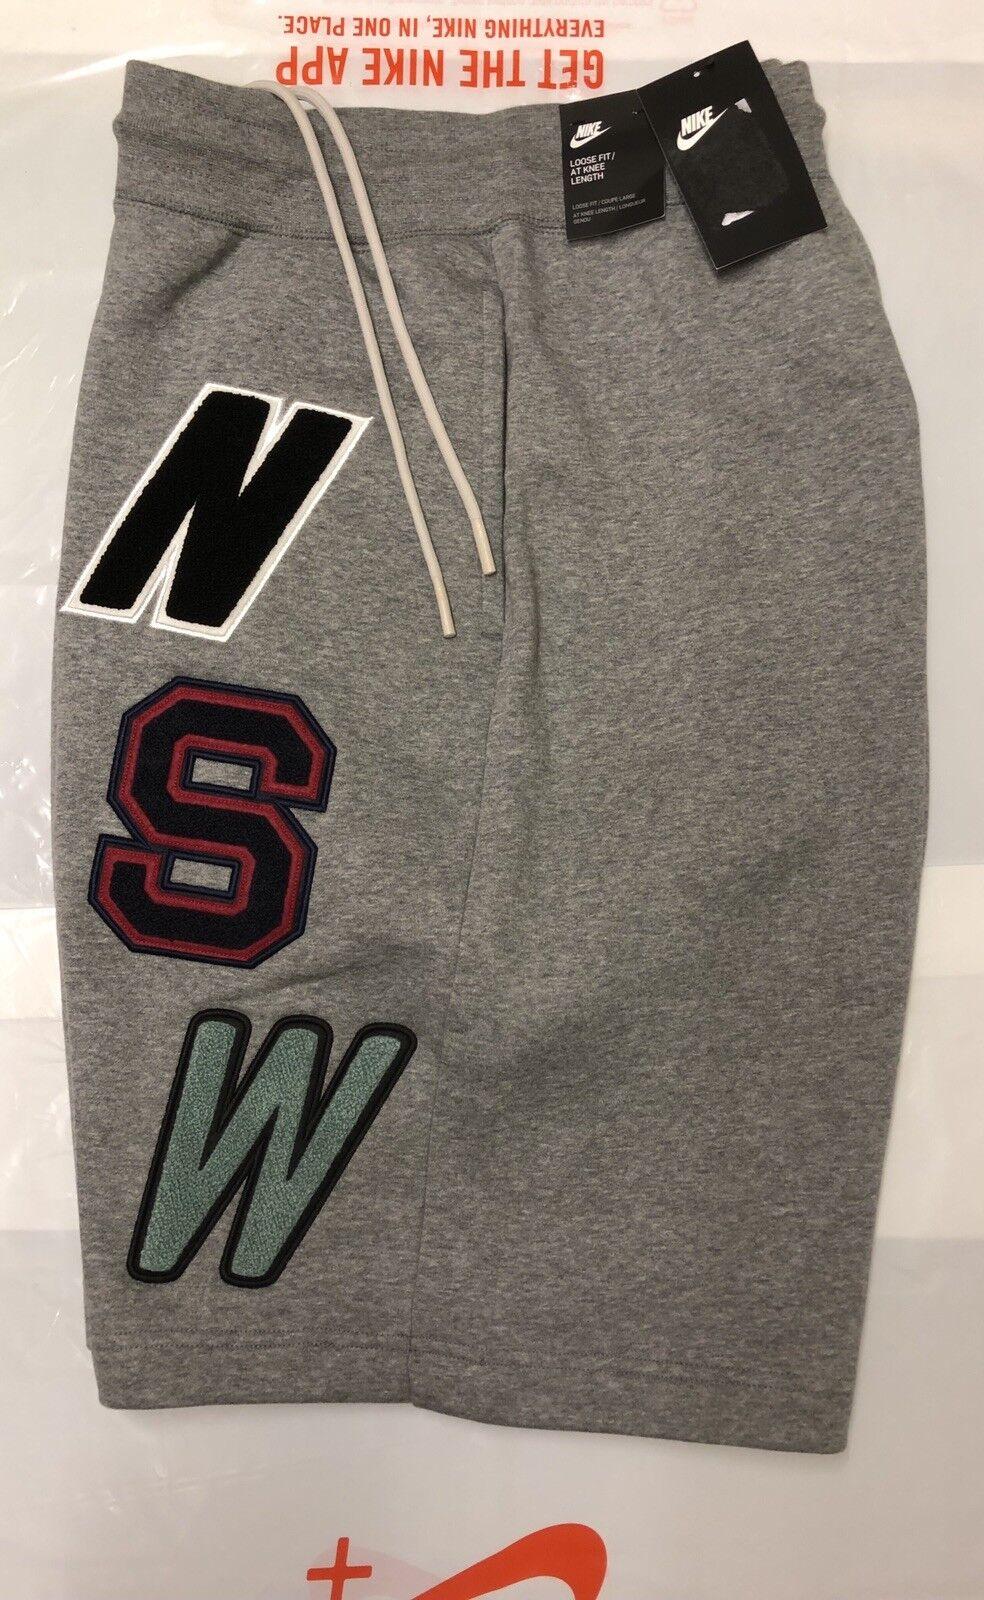 Nike Sportswear Nsw Pantaloncini da uomo in pile con Nuovo di Zecca TAG XL